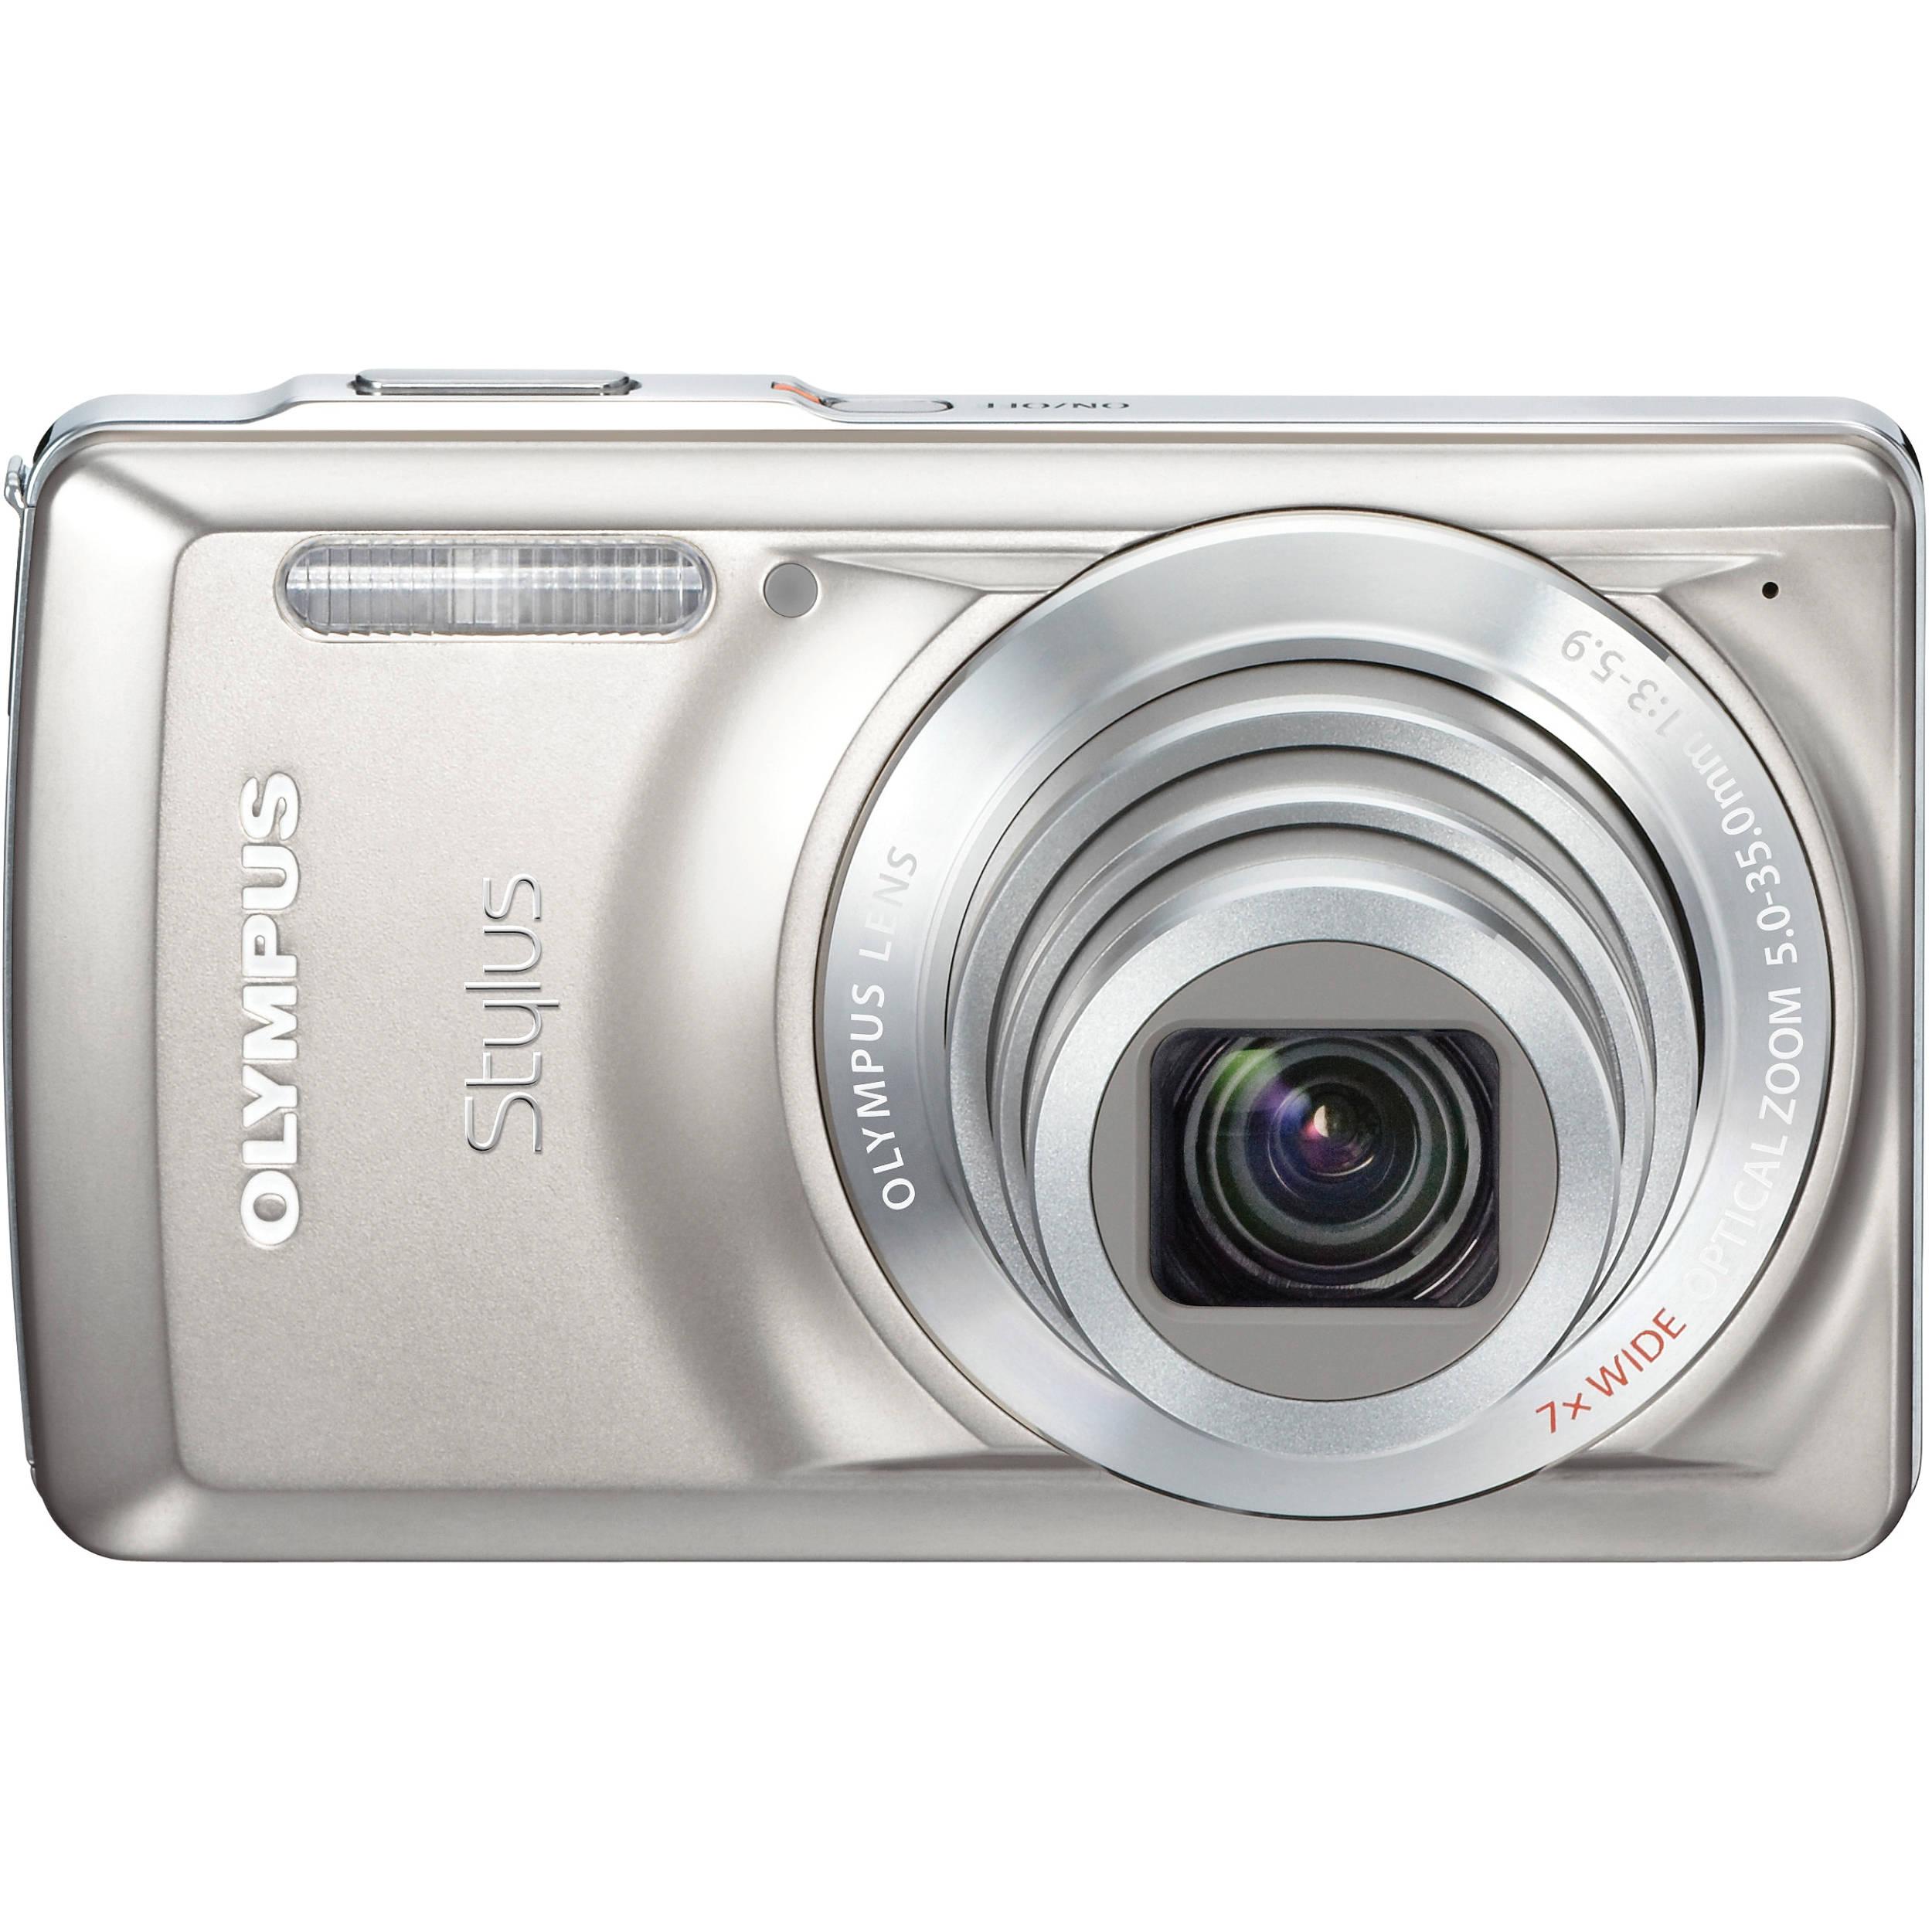 olympus stylus 7030 digital camera titanium 227585 b h photo rh bhphotovideo com Olympus Stylus Zoom 140 Olympus Stylus Film